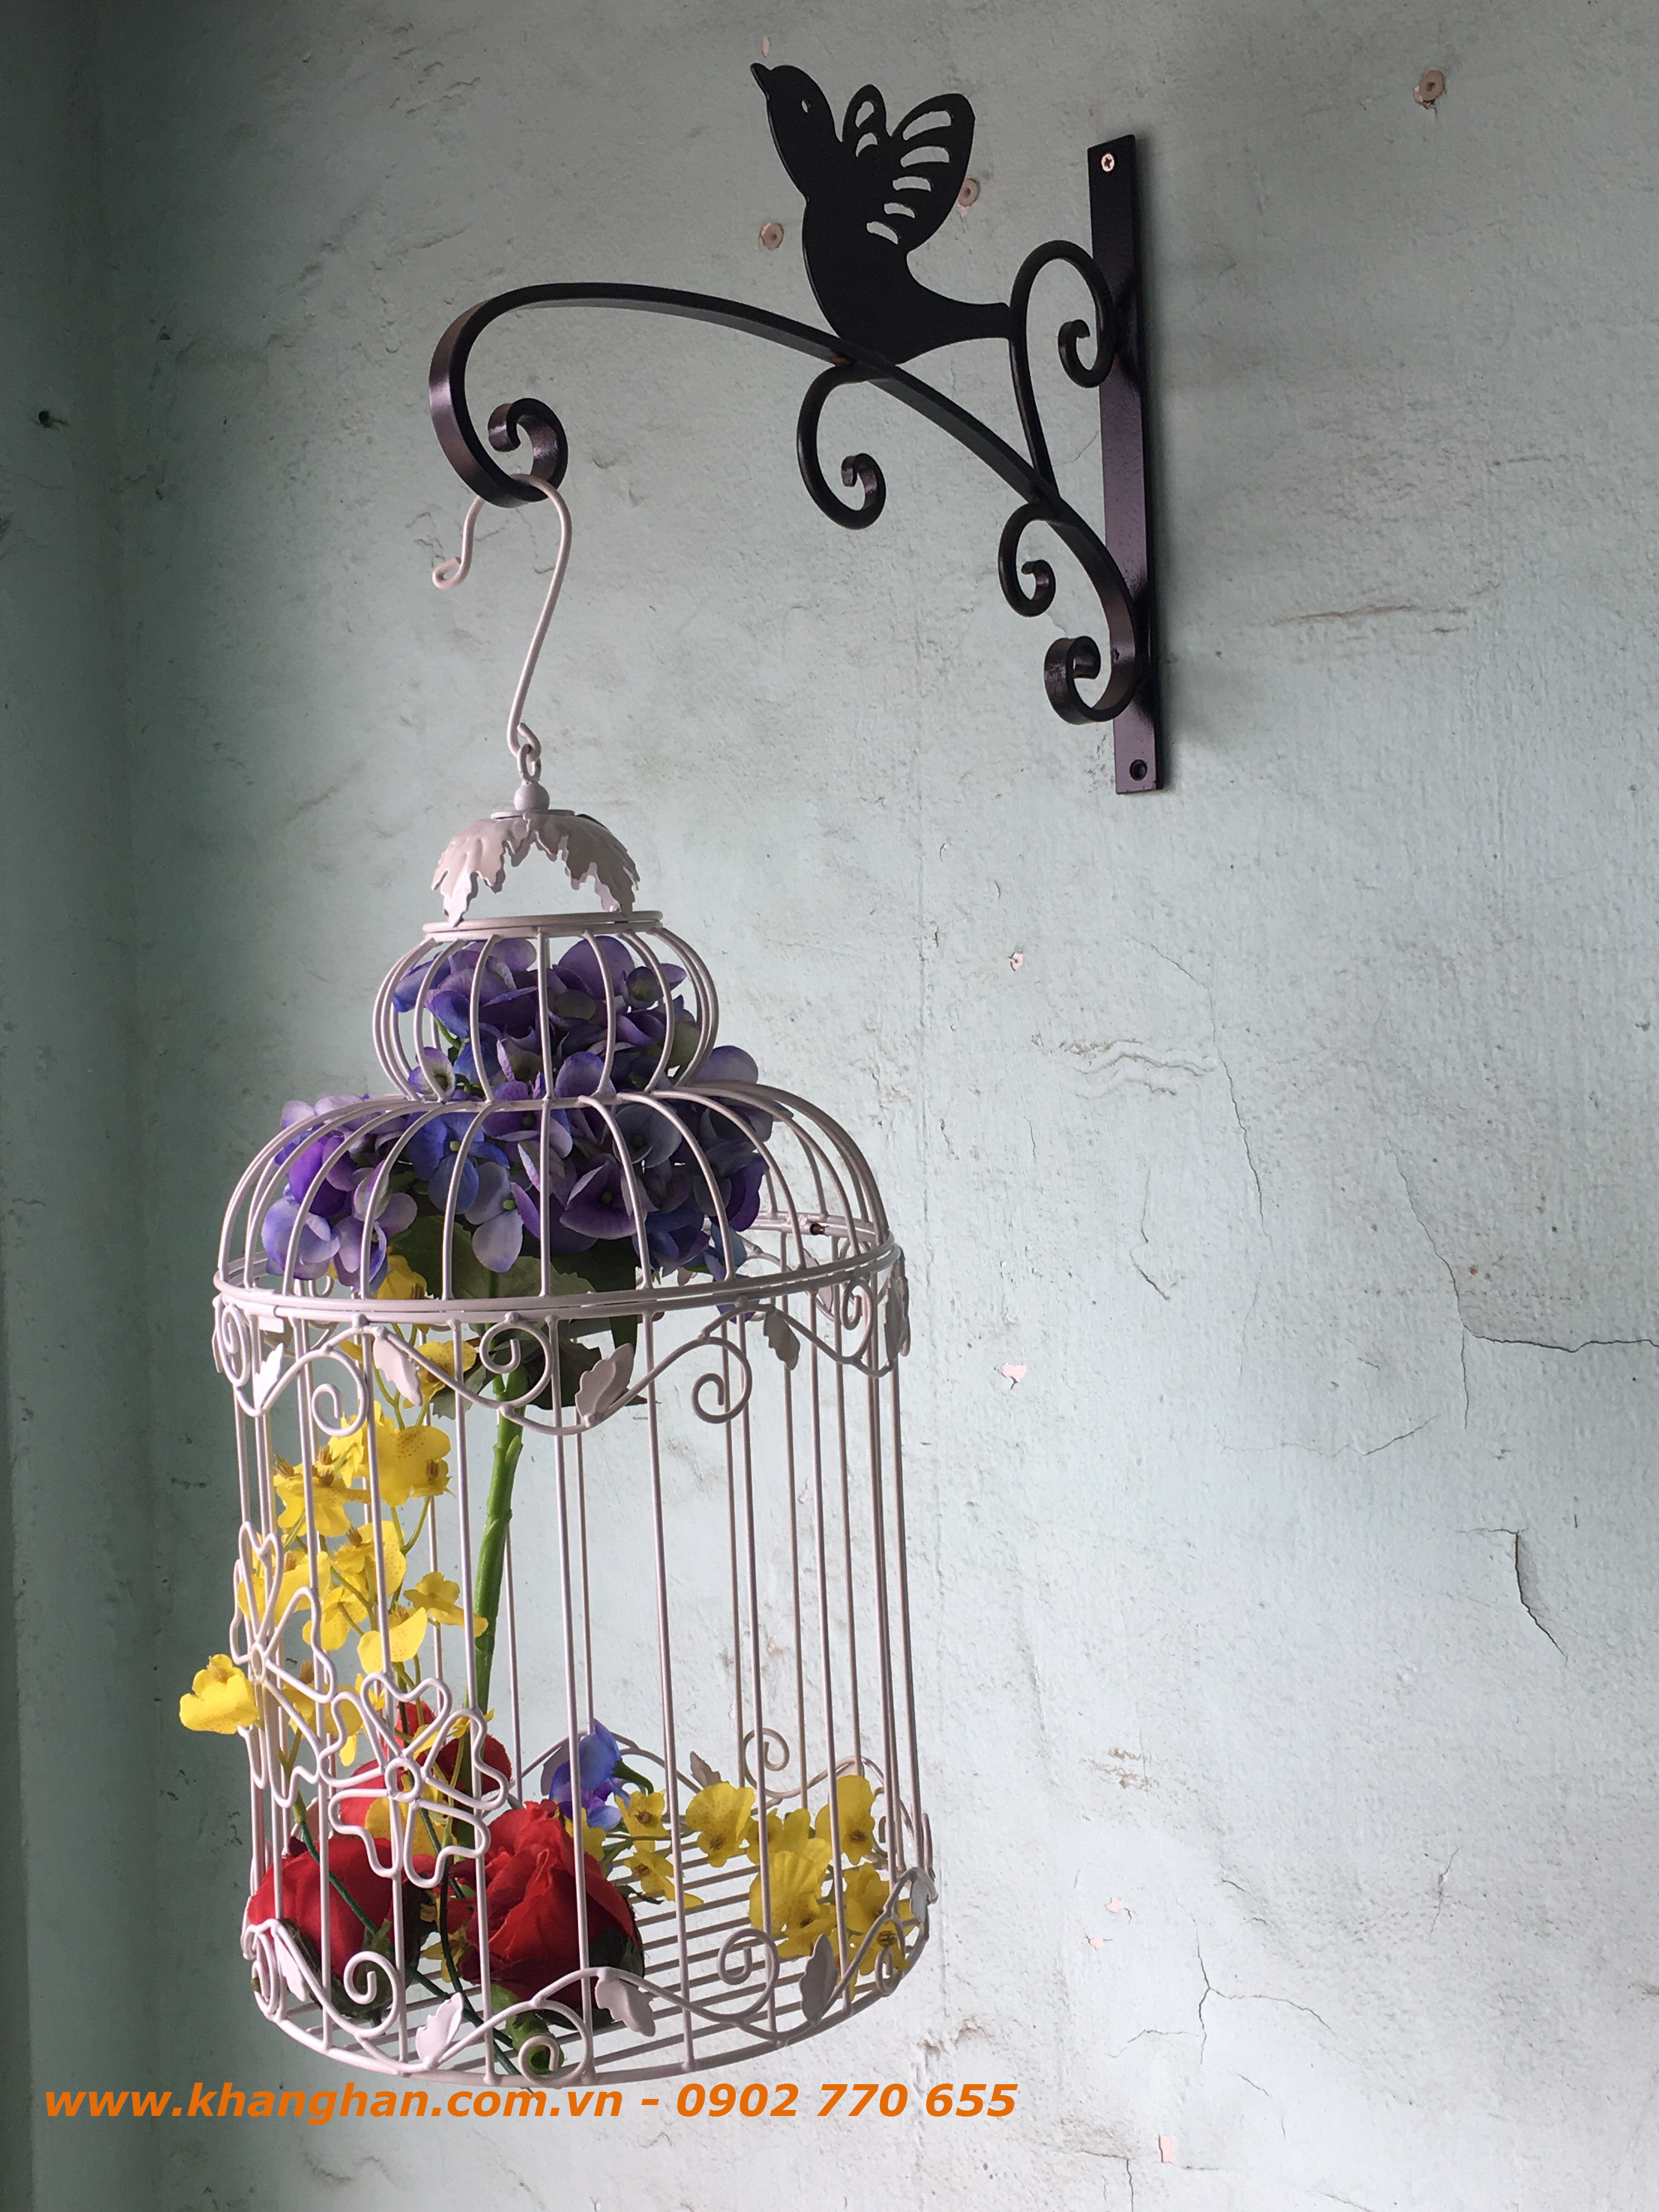 Lồng chim sắt mỹ thuật